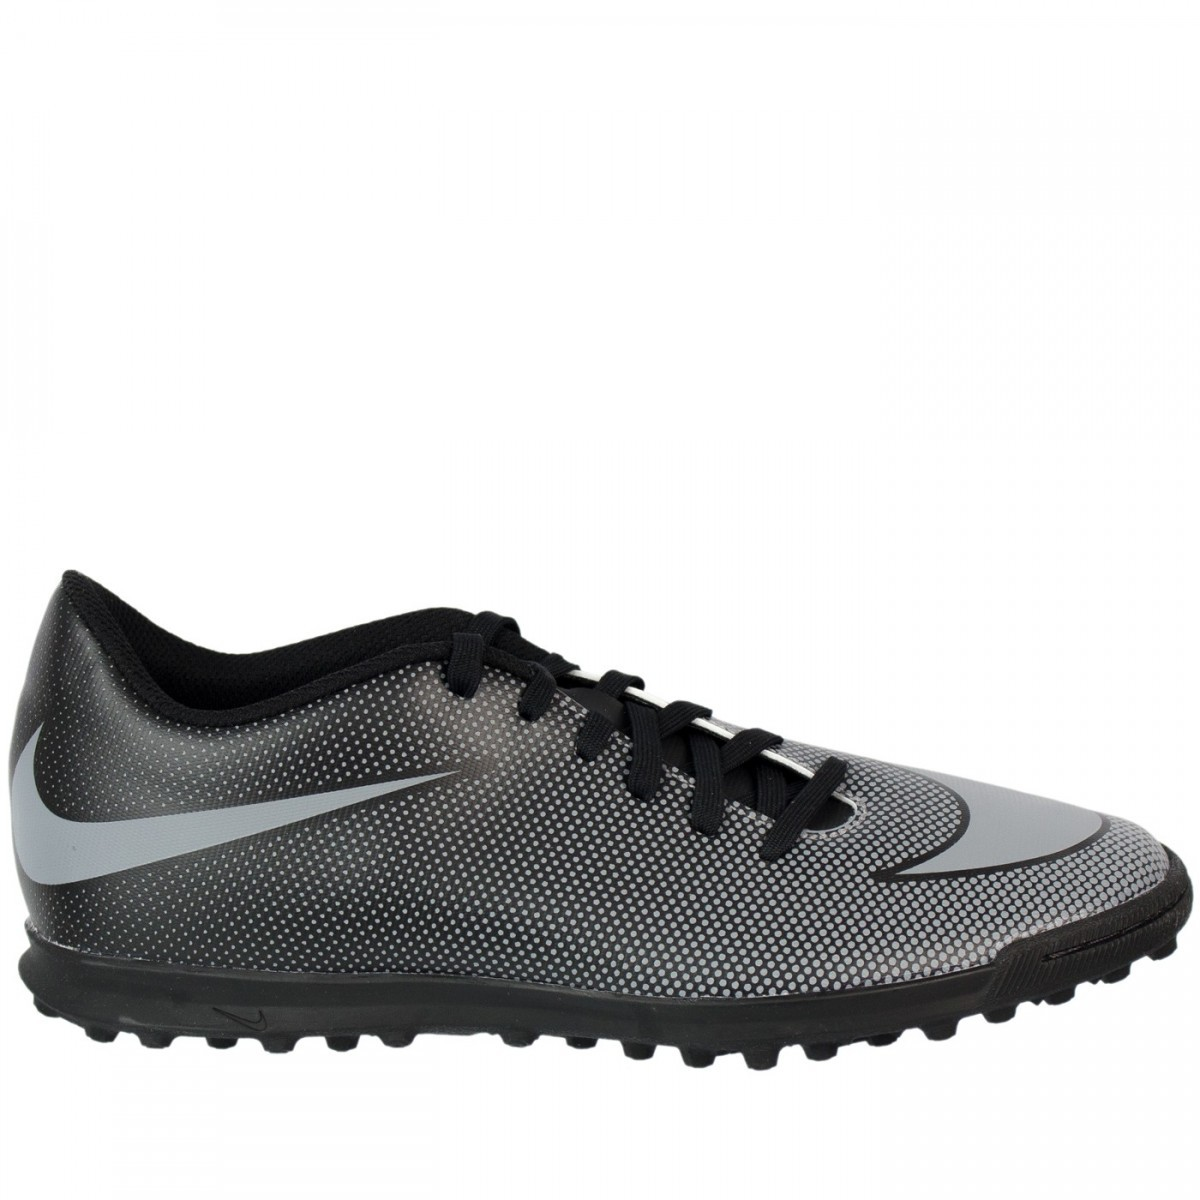 cc200d5c3cfa1 Bizz Store - Chuteira Society Infantil Menino Nike Bravata II JR